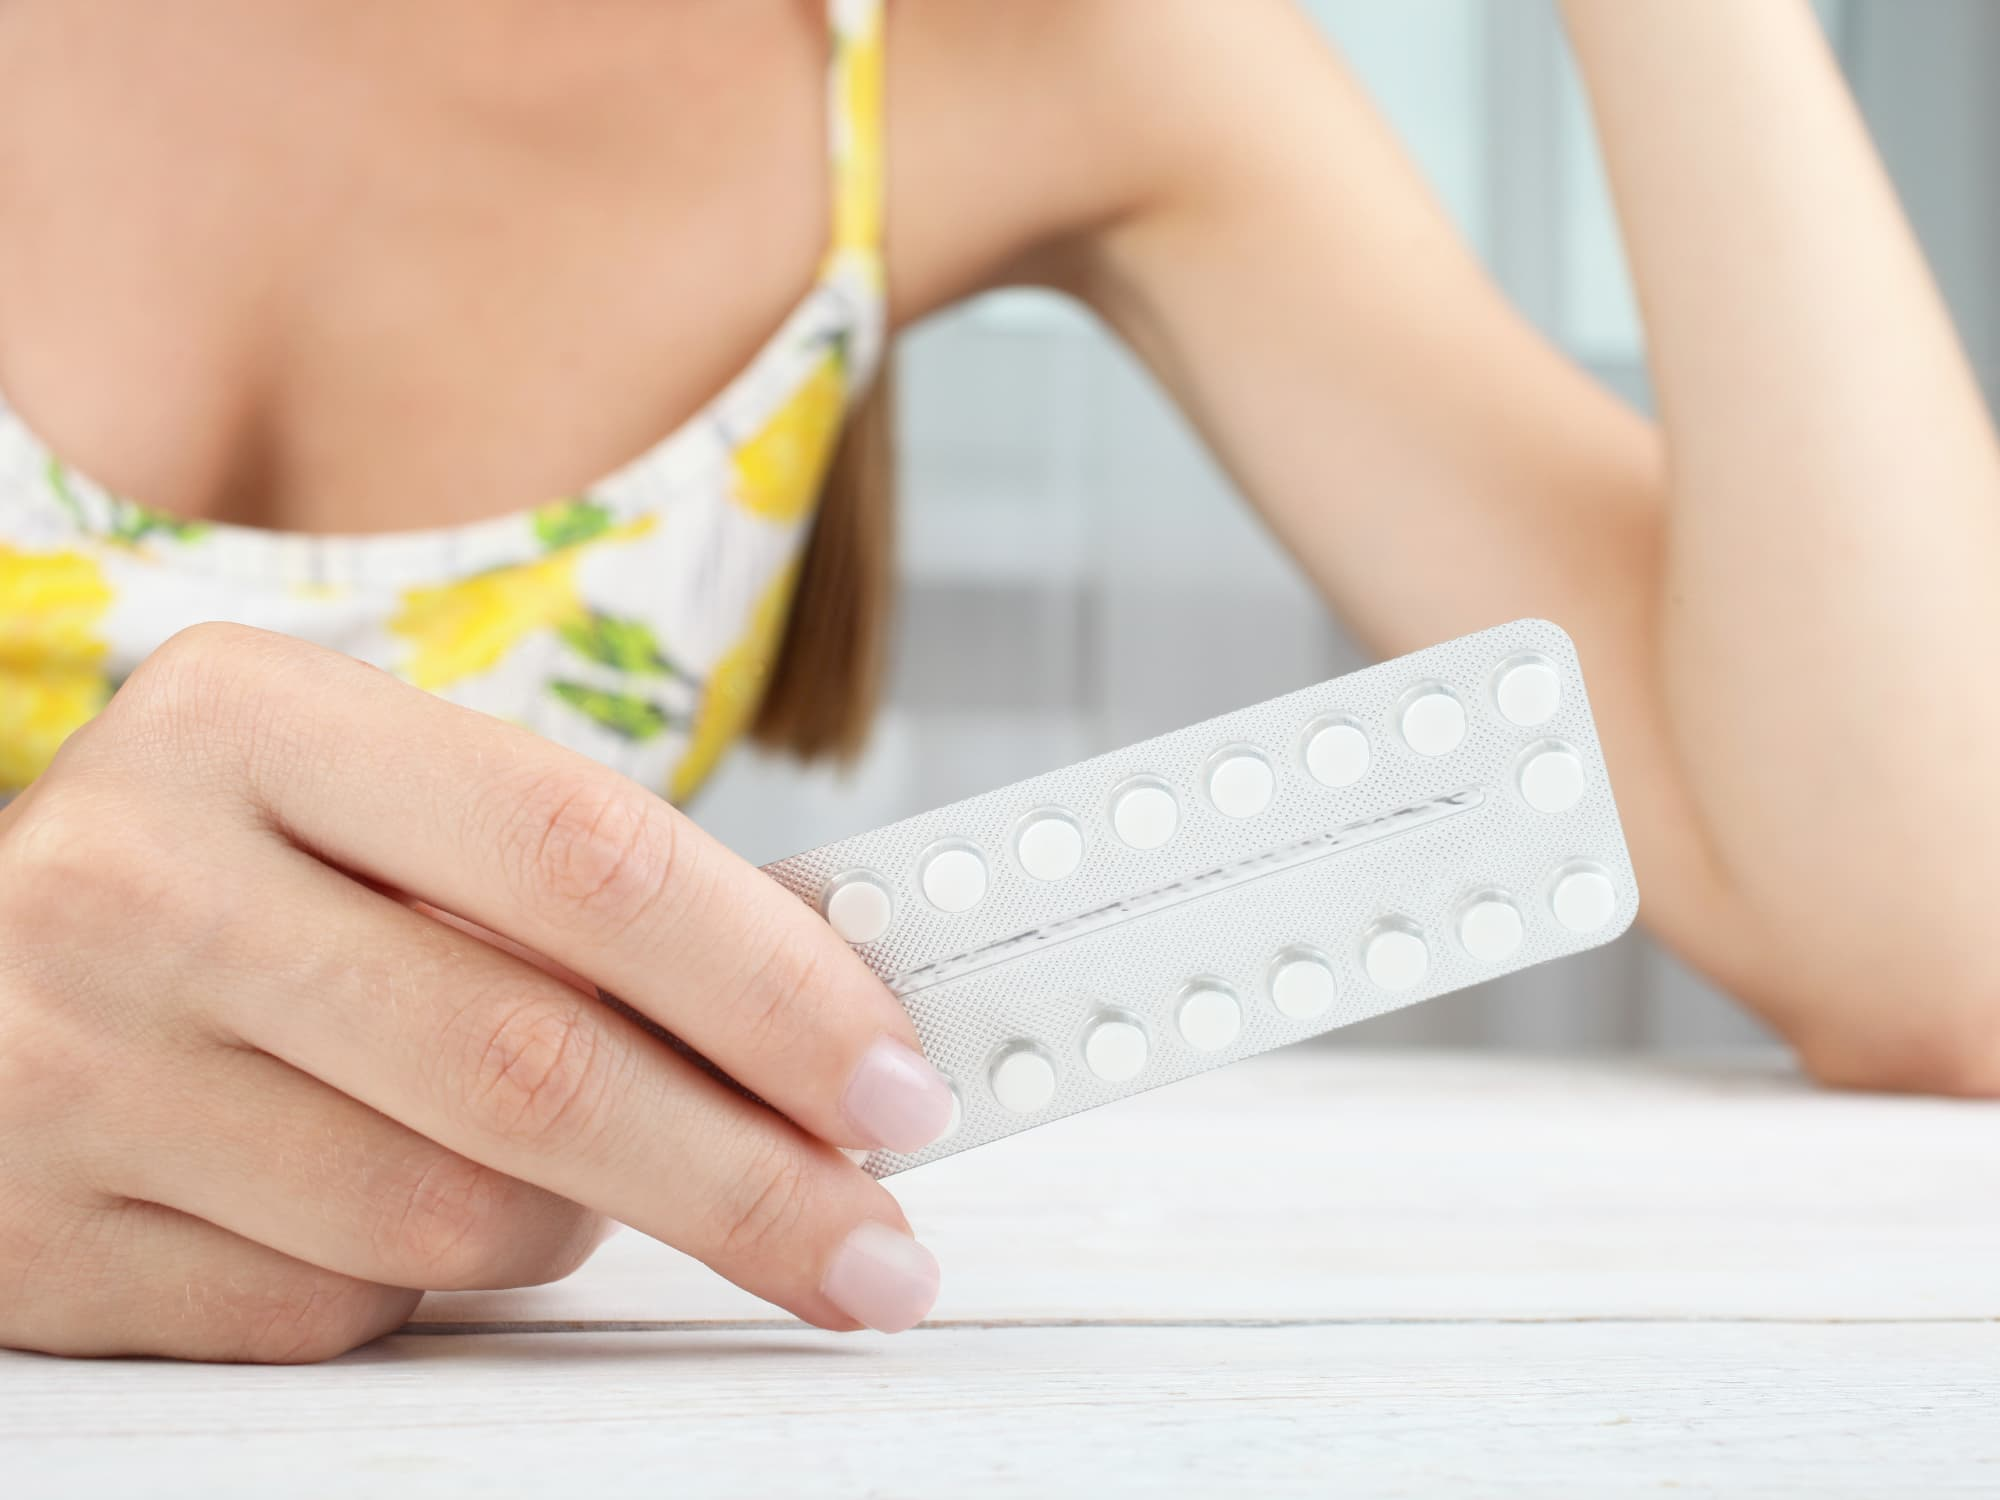 https://totalwomenshealthmia.com/wp-content/uploads/2020/09/Contraception.jpg